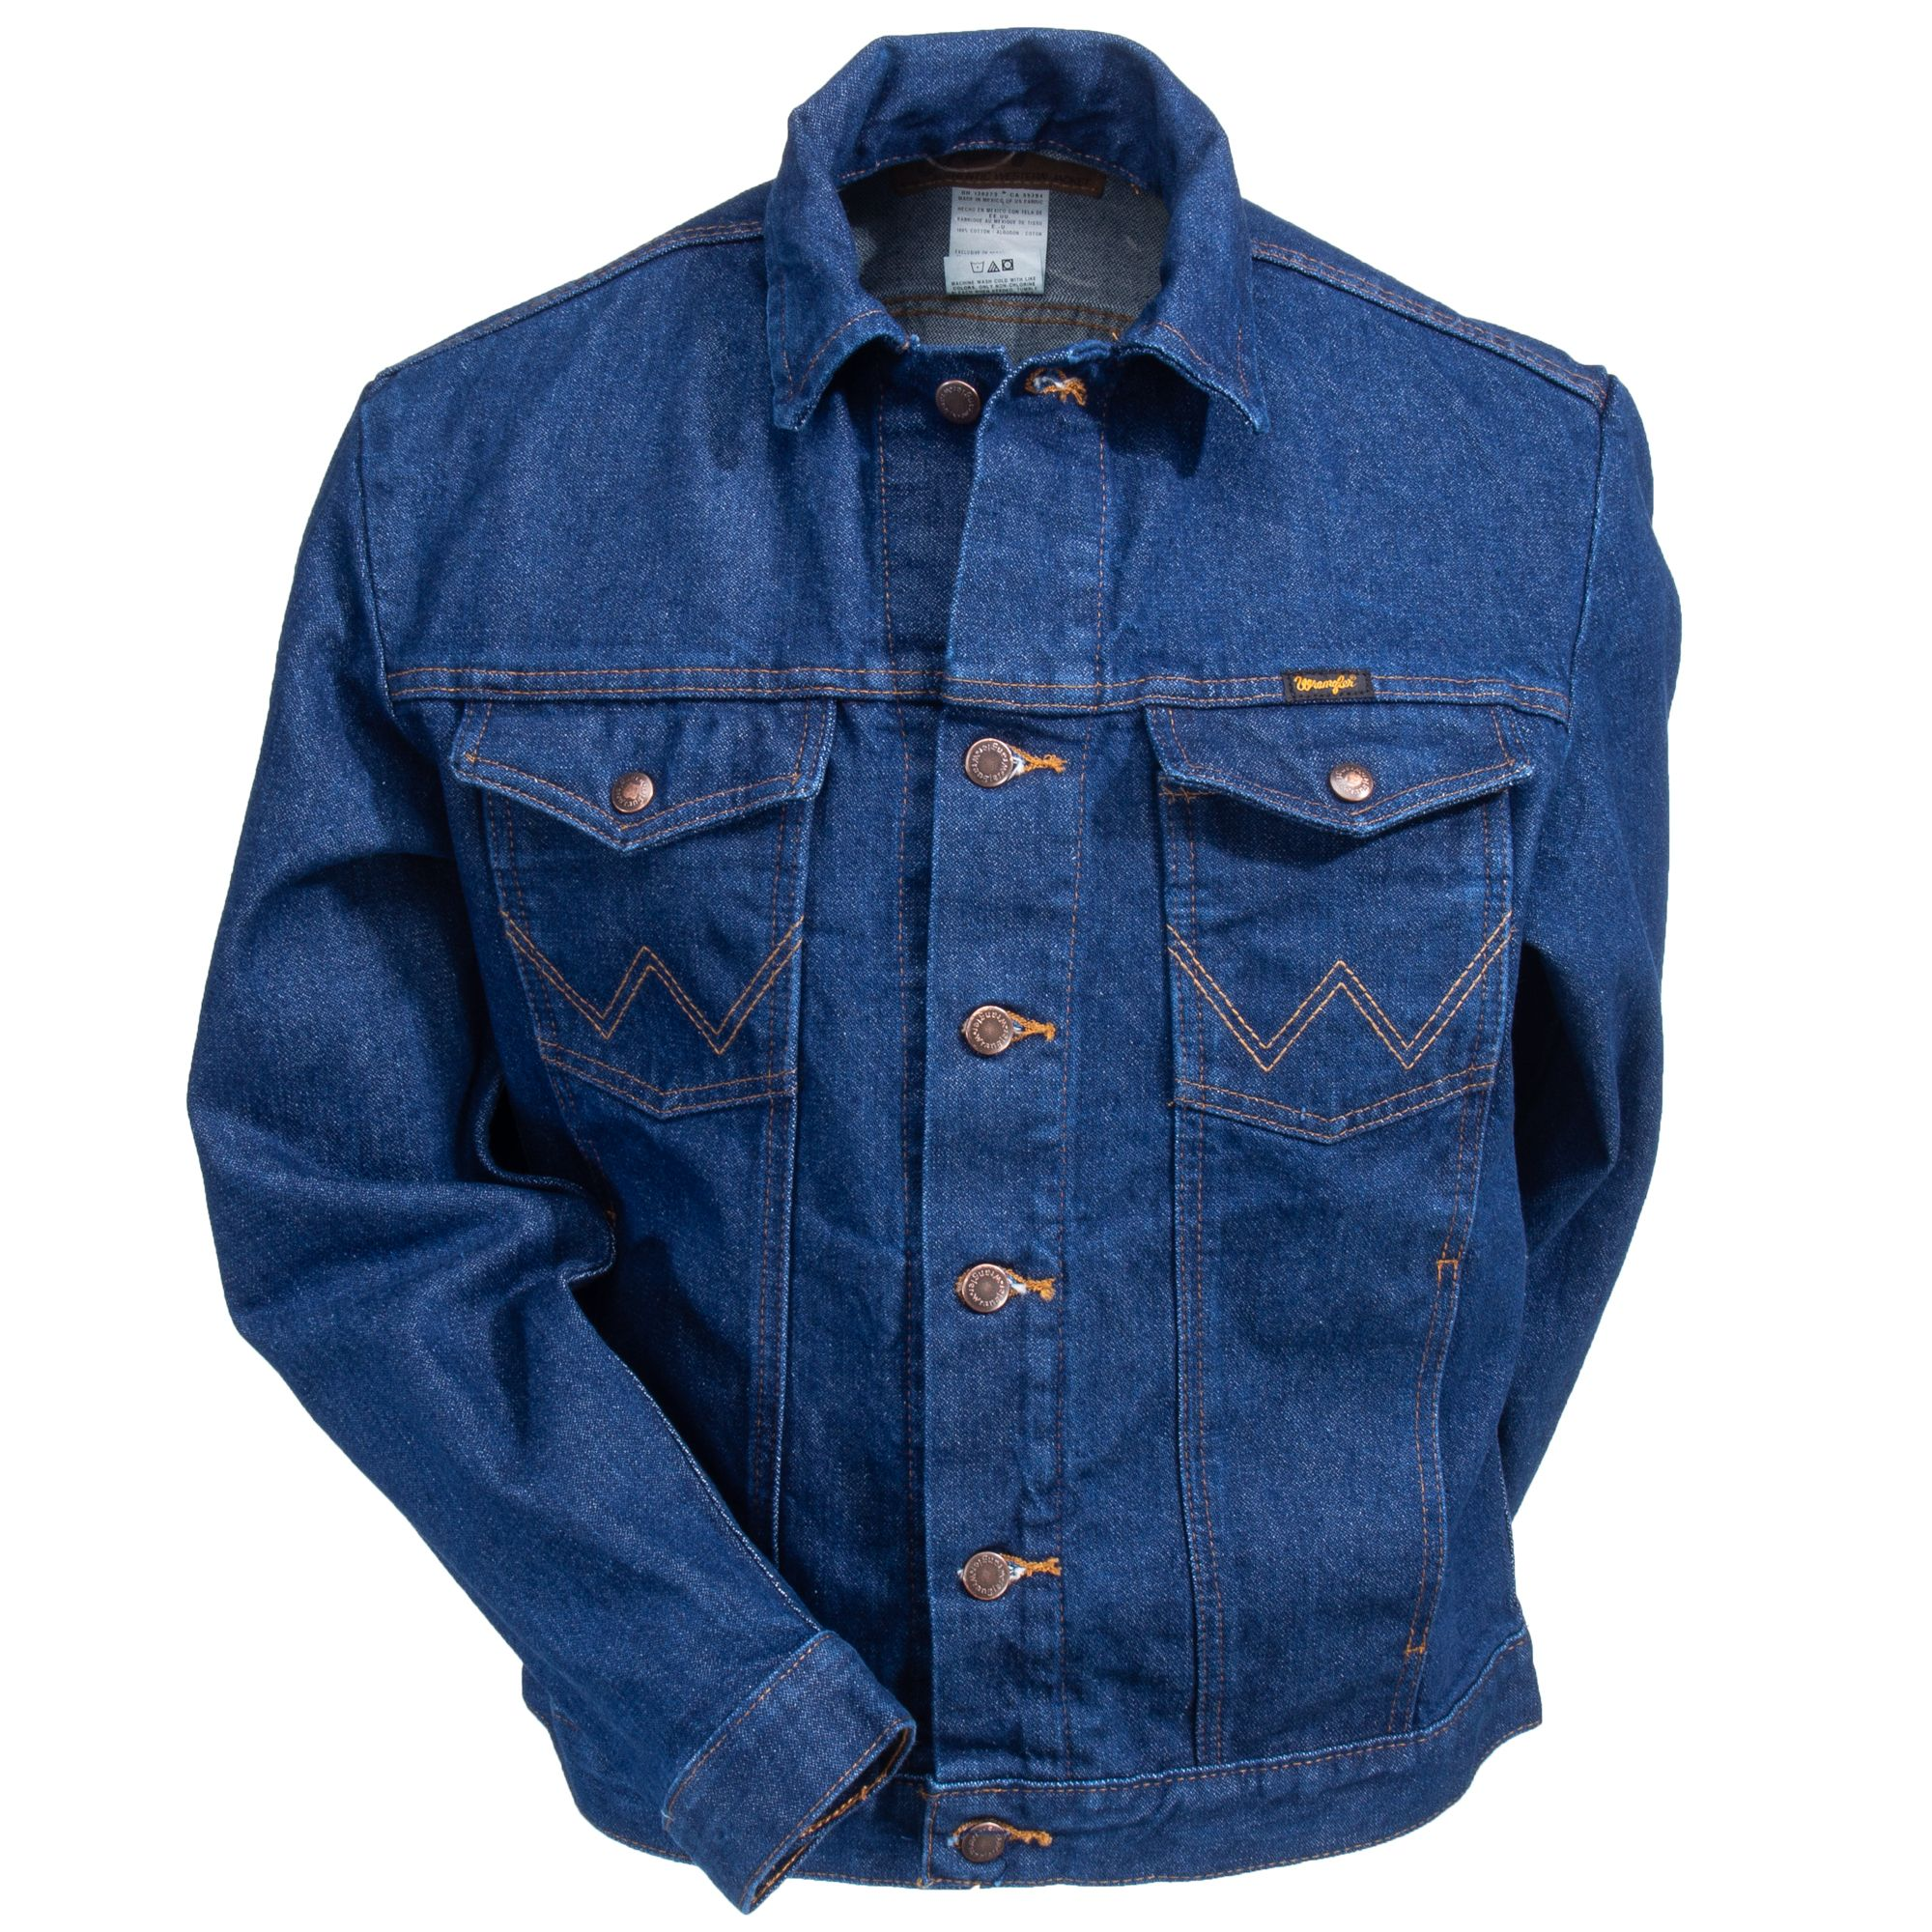 Wrangler Men S 74145 Pw Unlined Prewashed Denim Jacket Jackets Denim Denim Jacket [ 2000 x 2000 Pixel ]